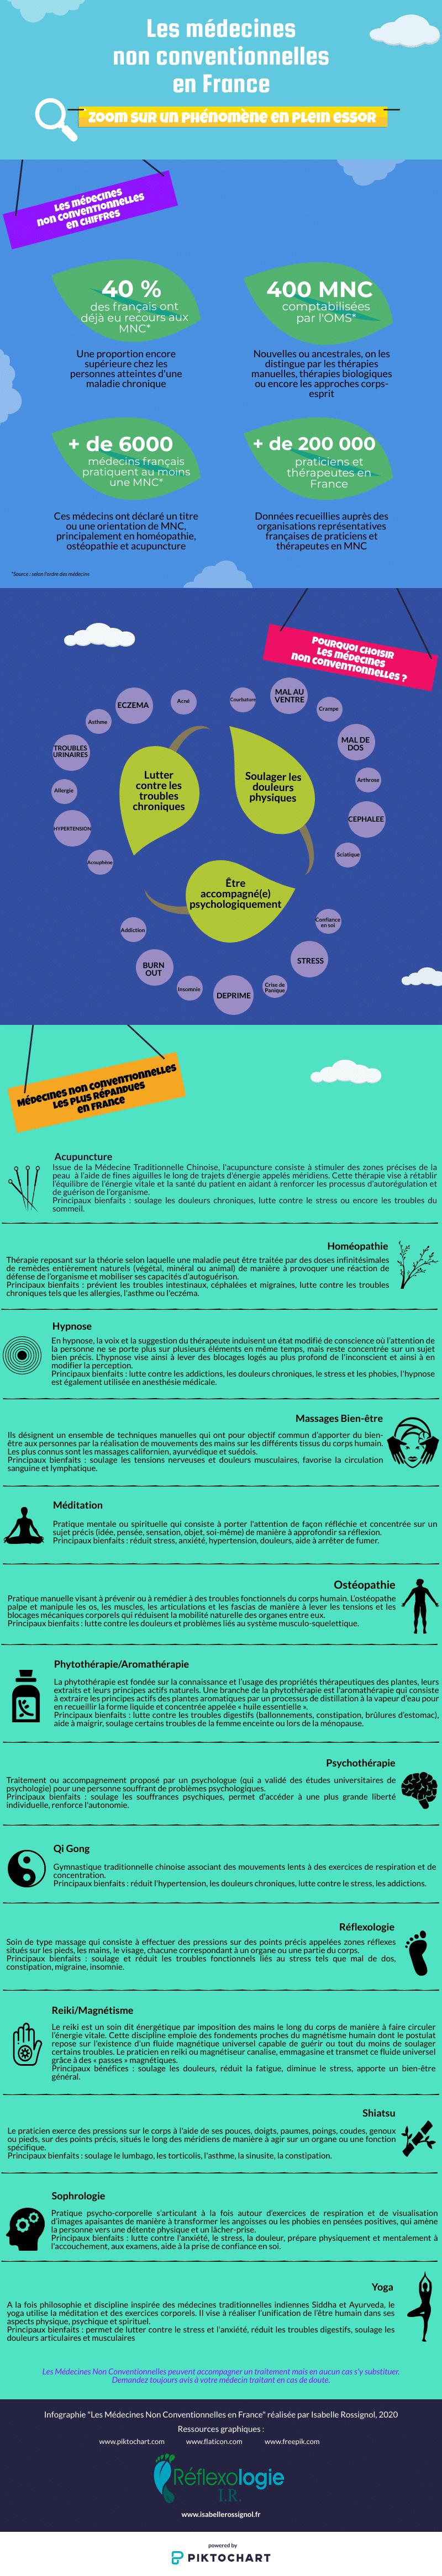 Infographie-medecines-douces-2020